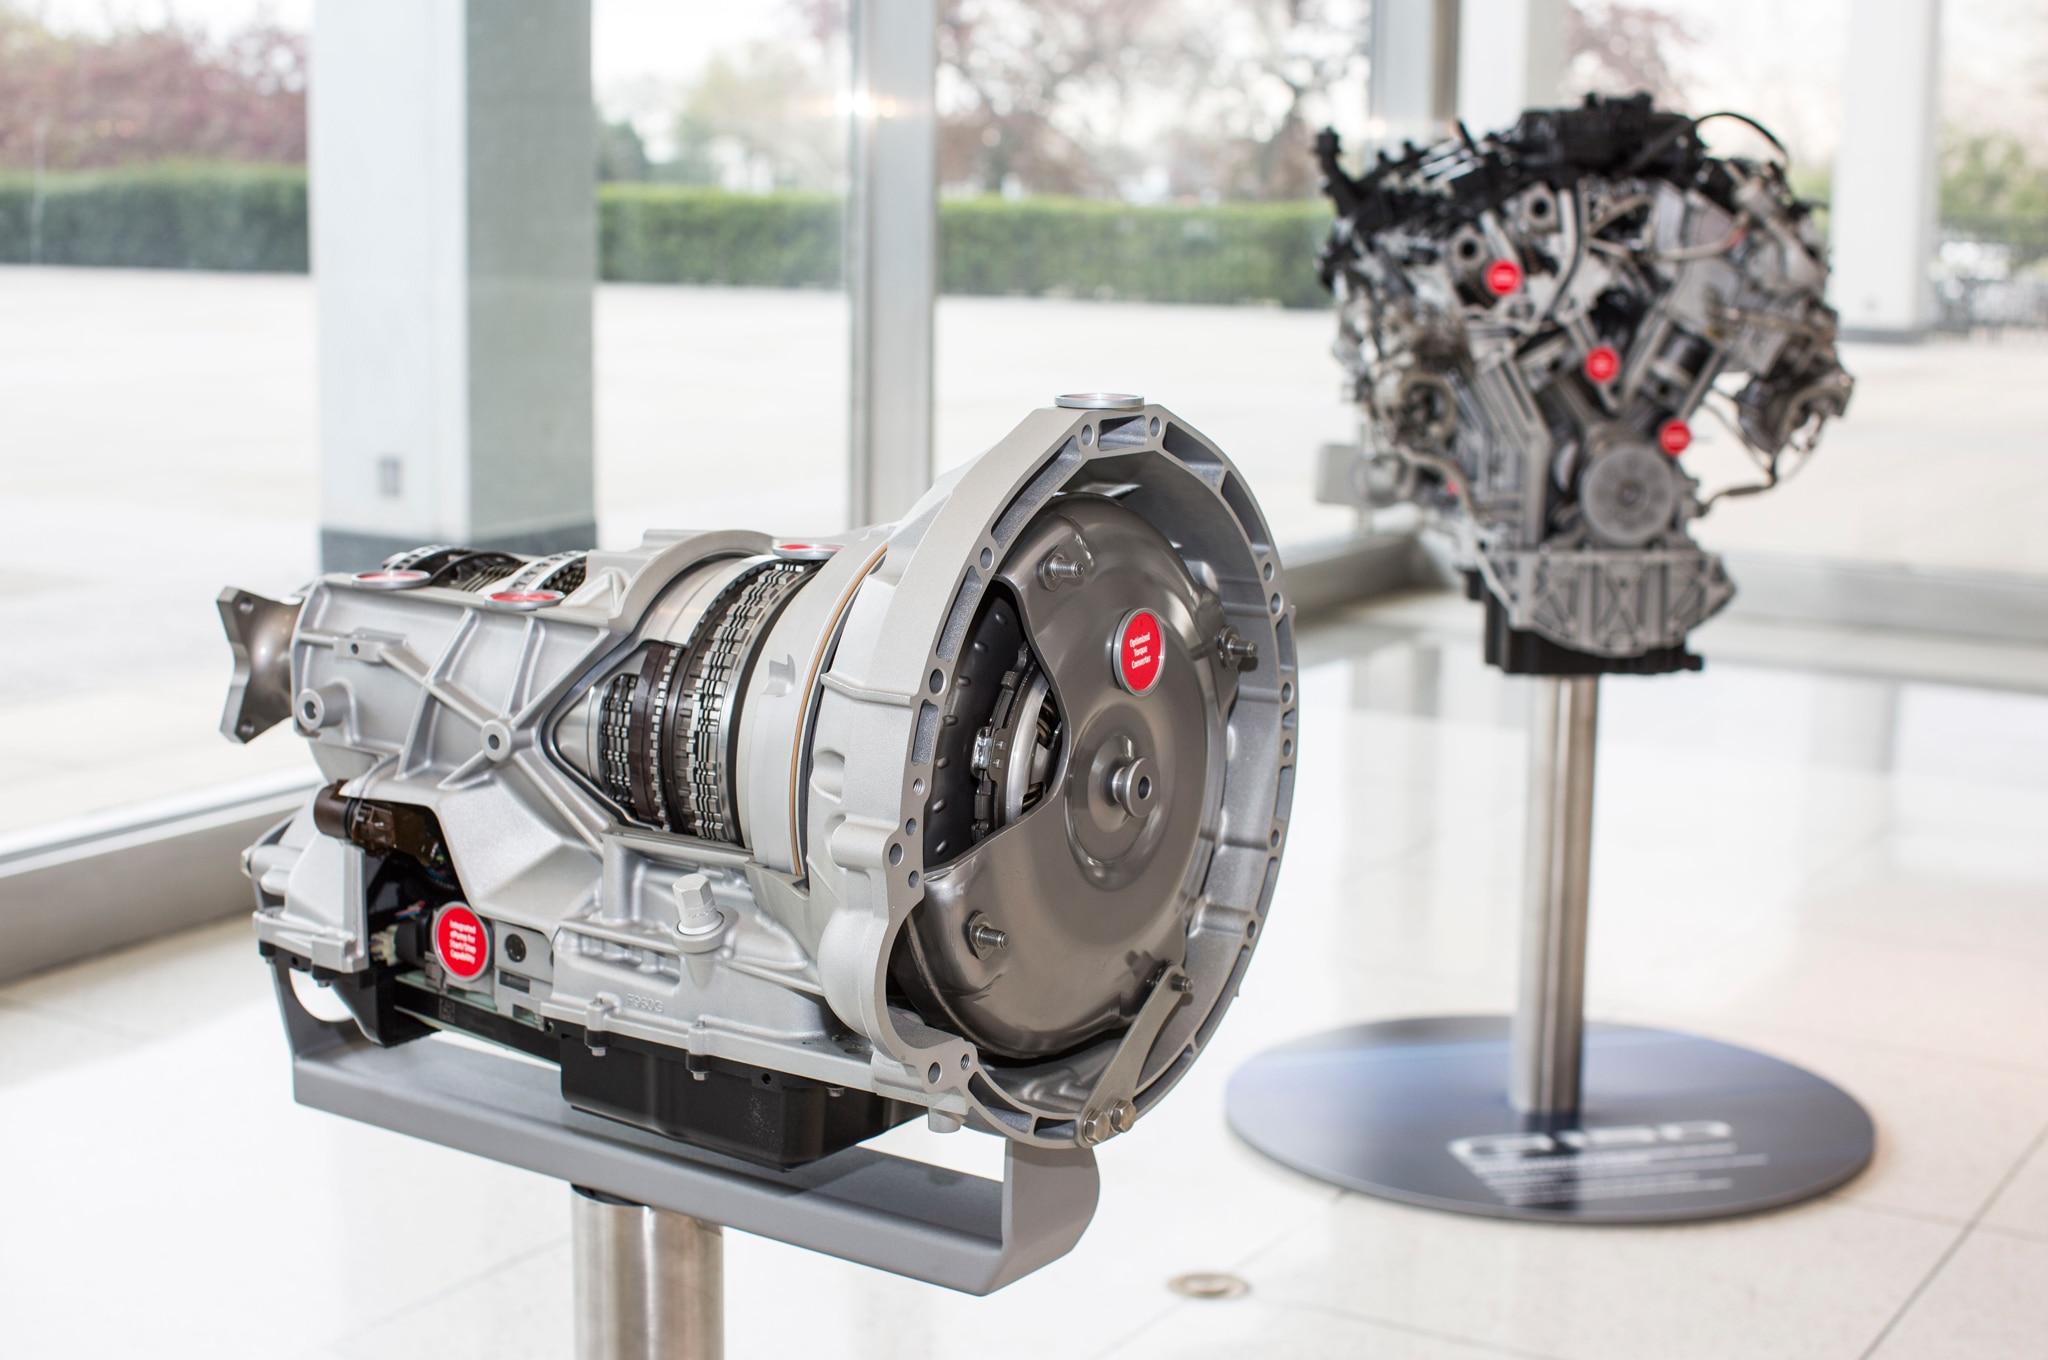 2017 Ford F 150 35 Liter EcoBoost Engine And 10 Speed Transmission